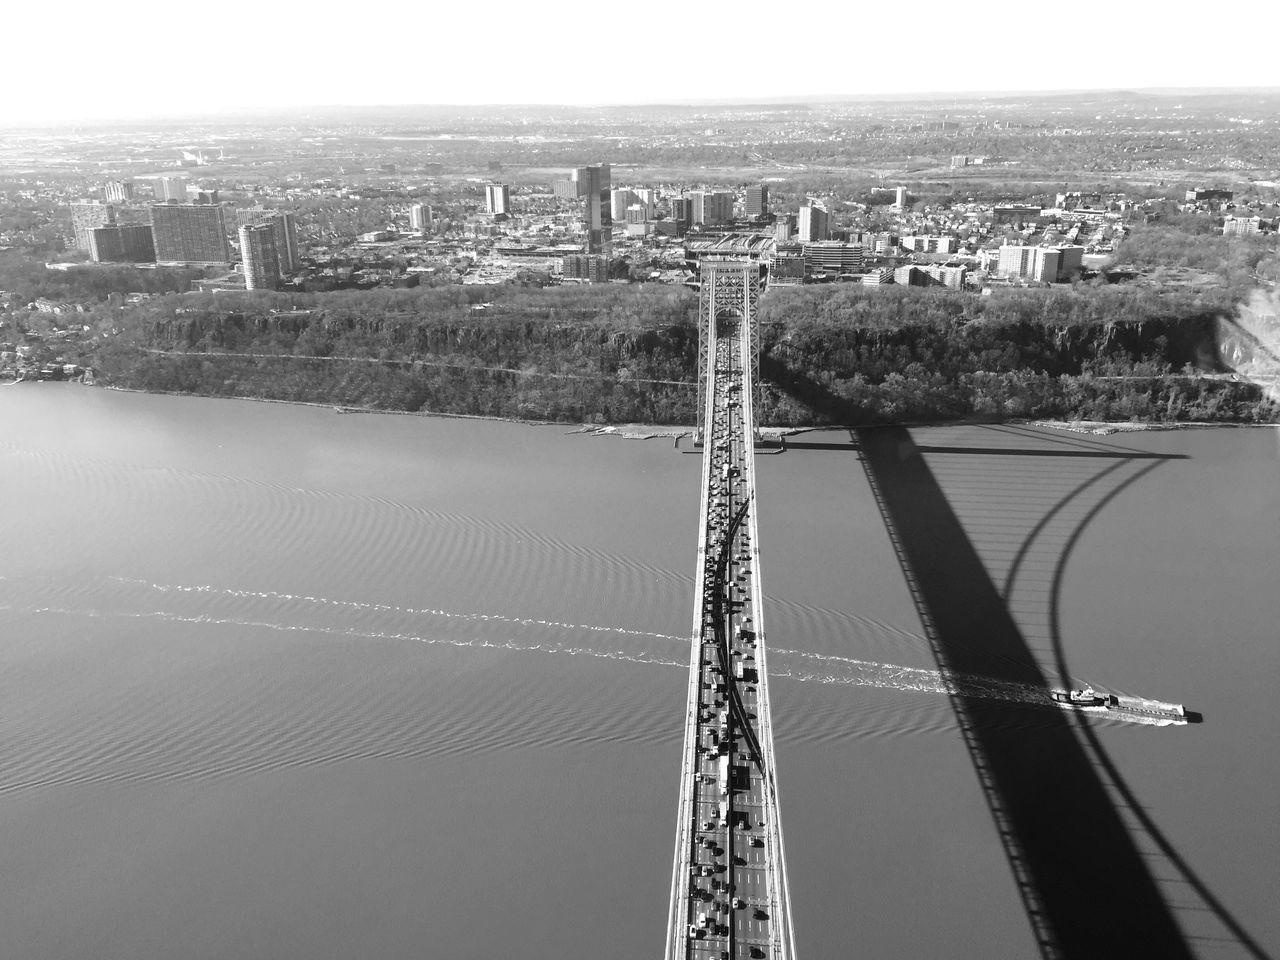 Aerial View Of Traffic On Bridge